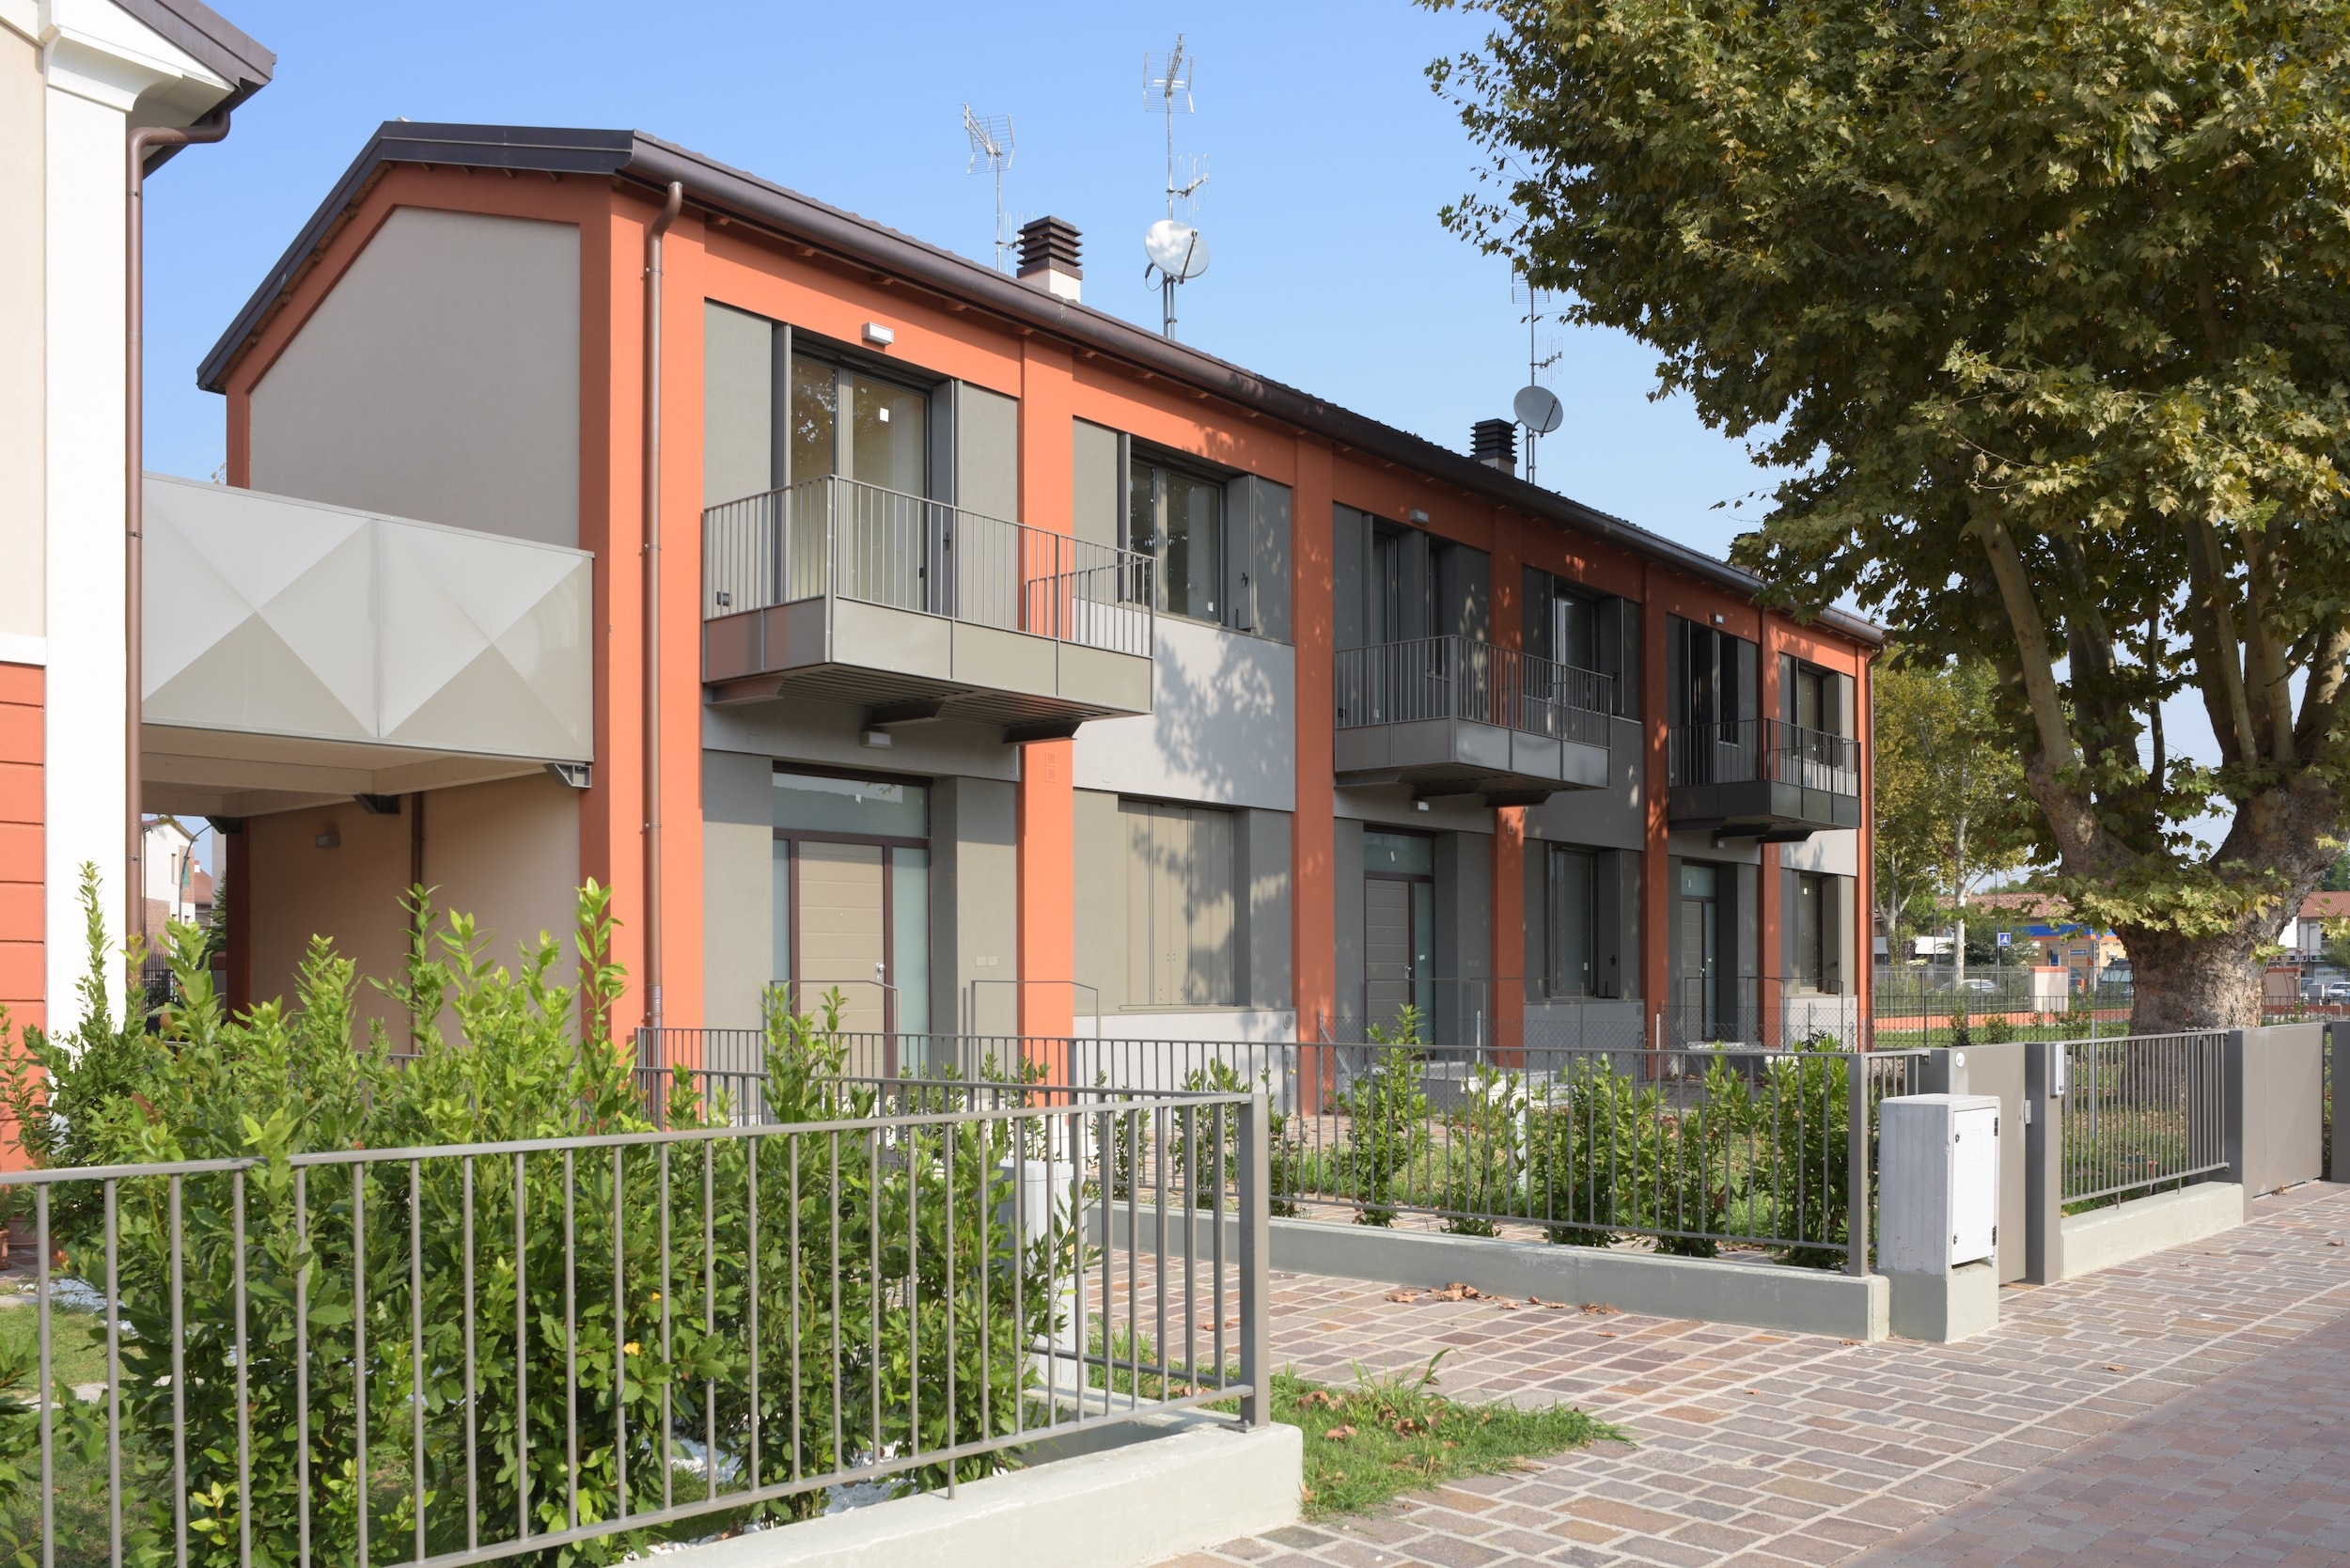 1335 Studio Bacchi Architetti Santa Chiara Residenziale